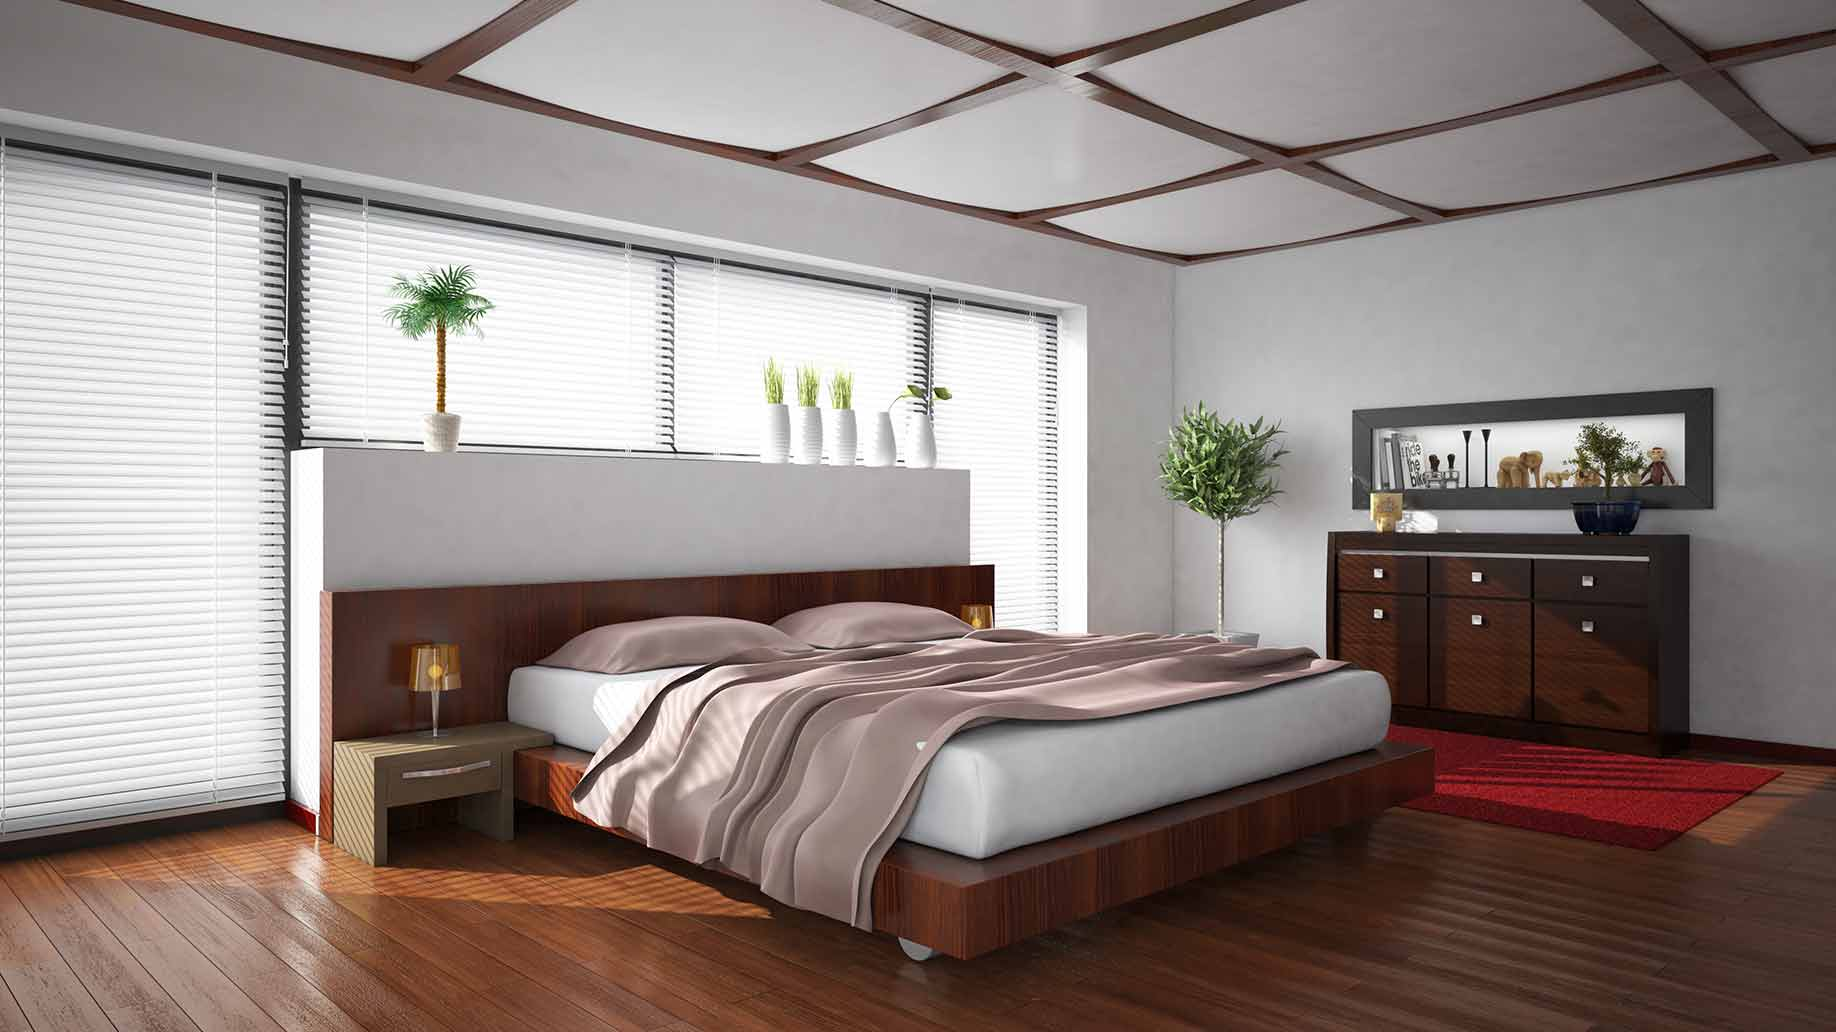 sleep better natural remedies optimize bedroom temperature light noise